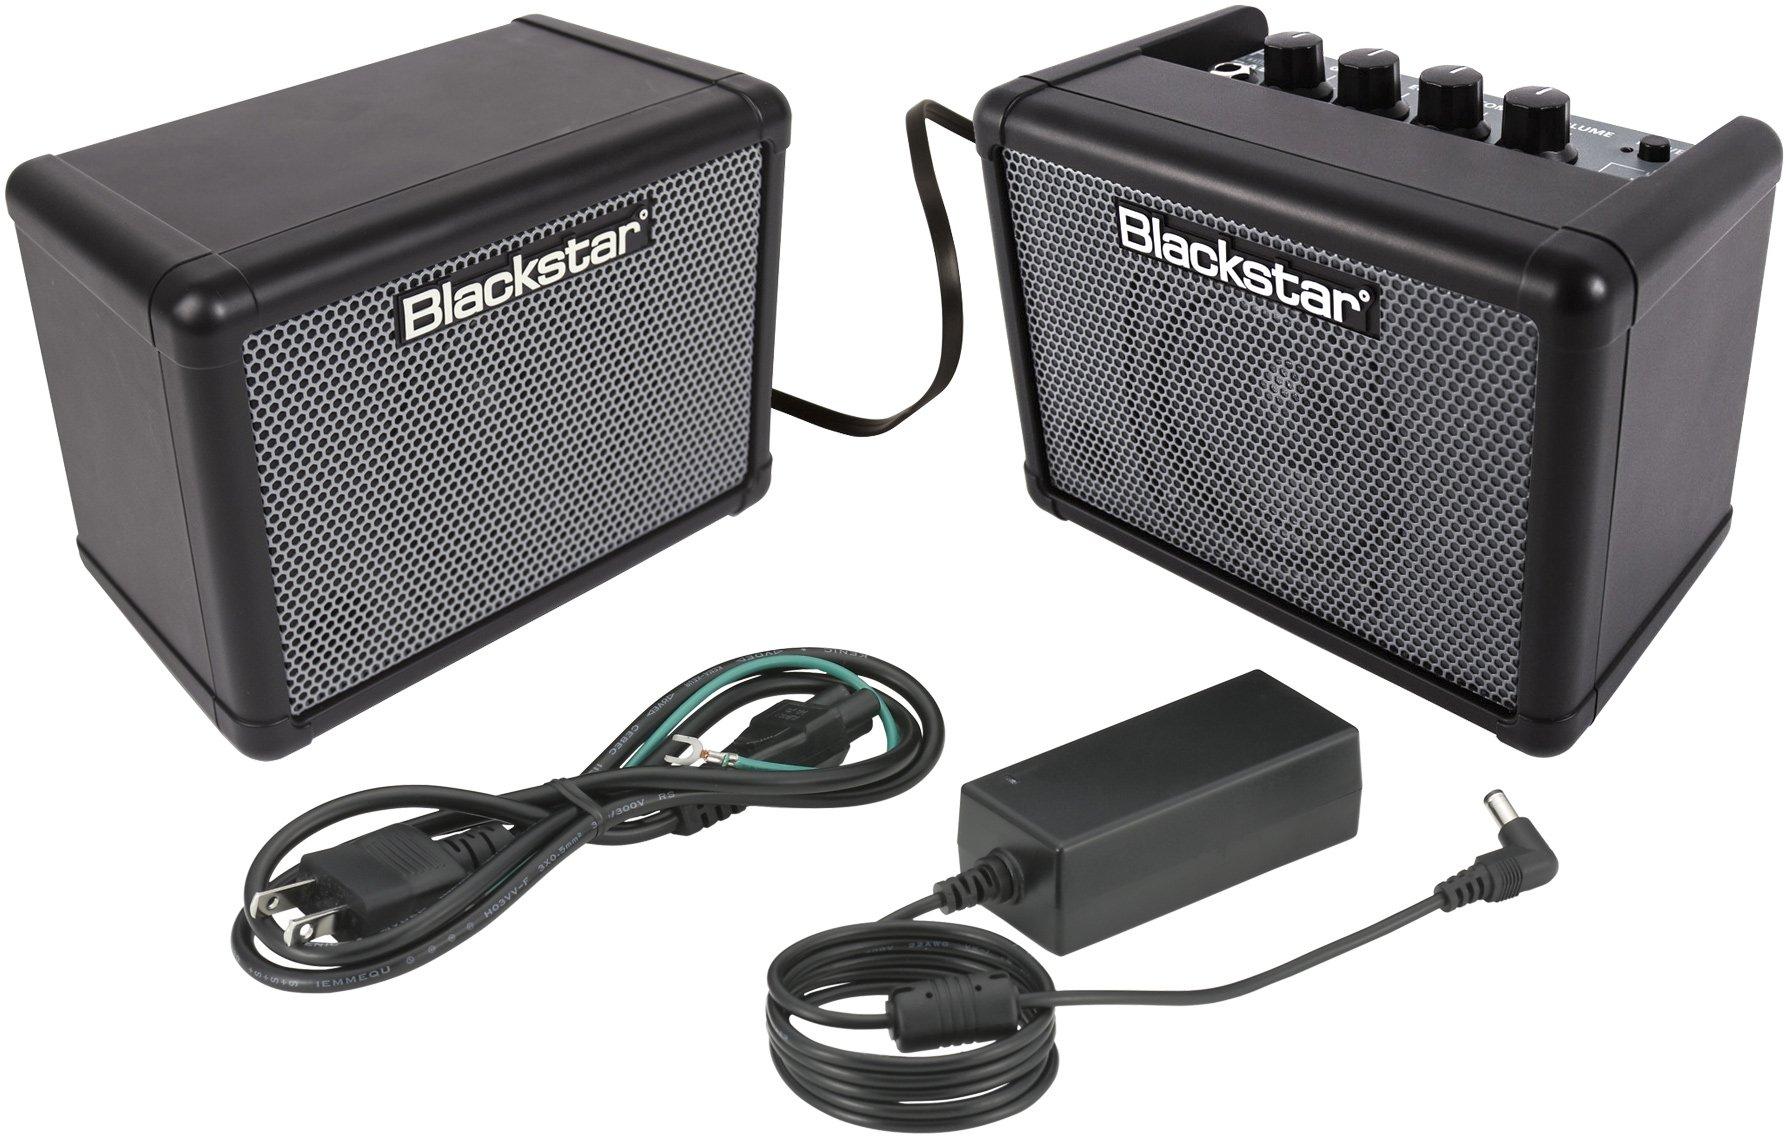 Blackstar Electric Guitar Power Amplifier (FLY3BASSPAK) by Blackstar